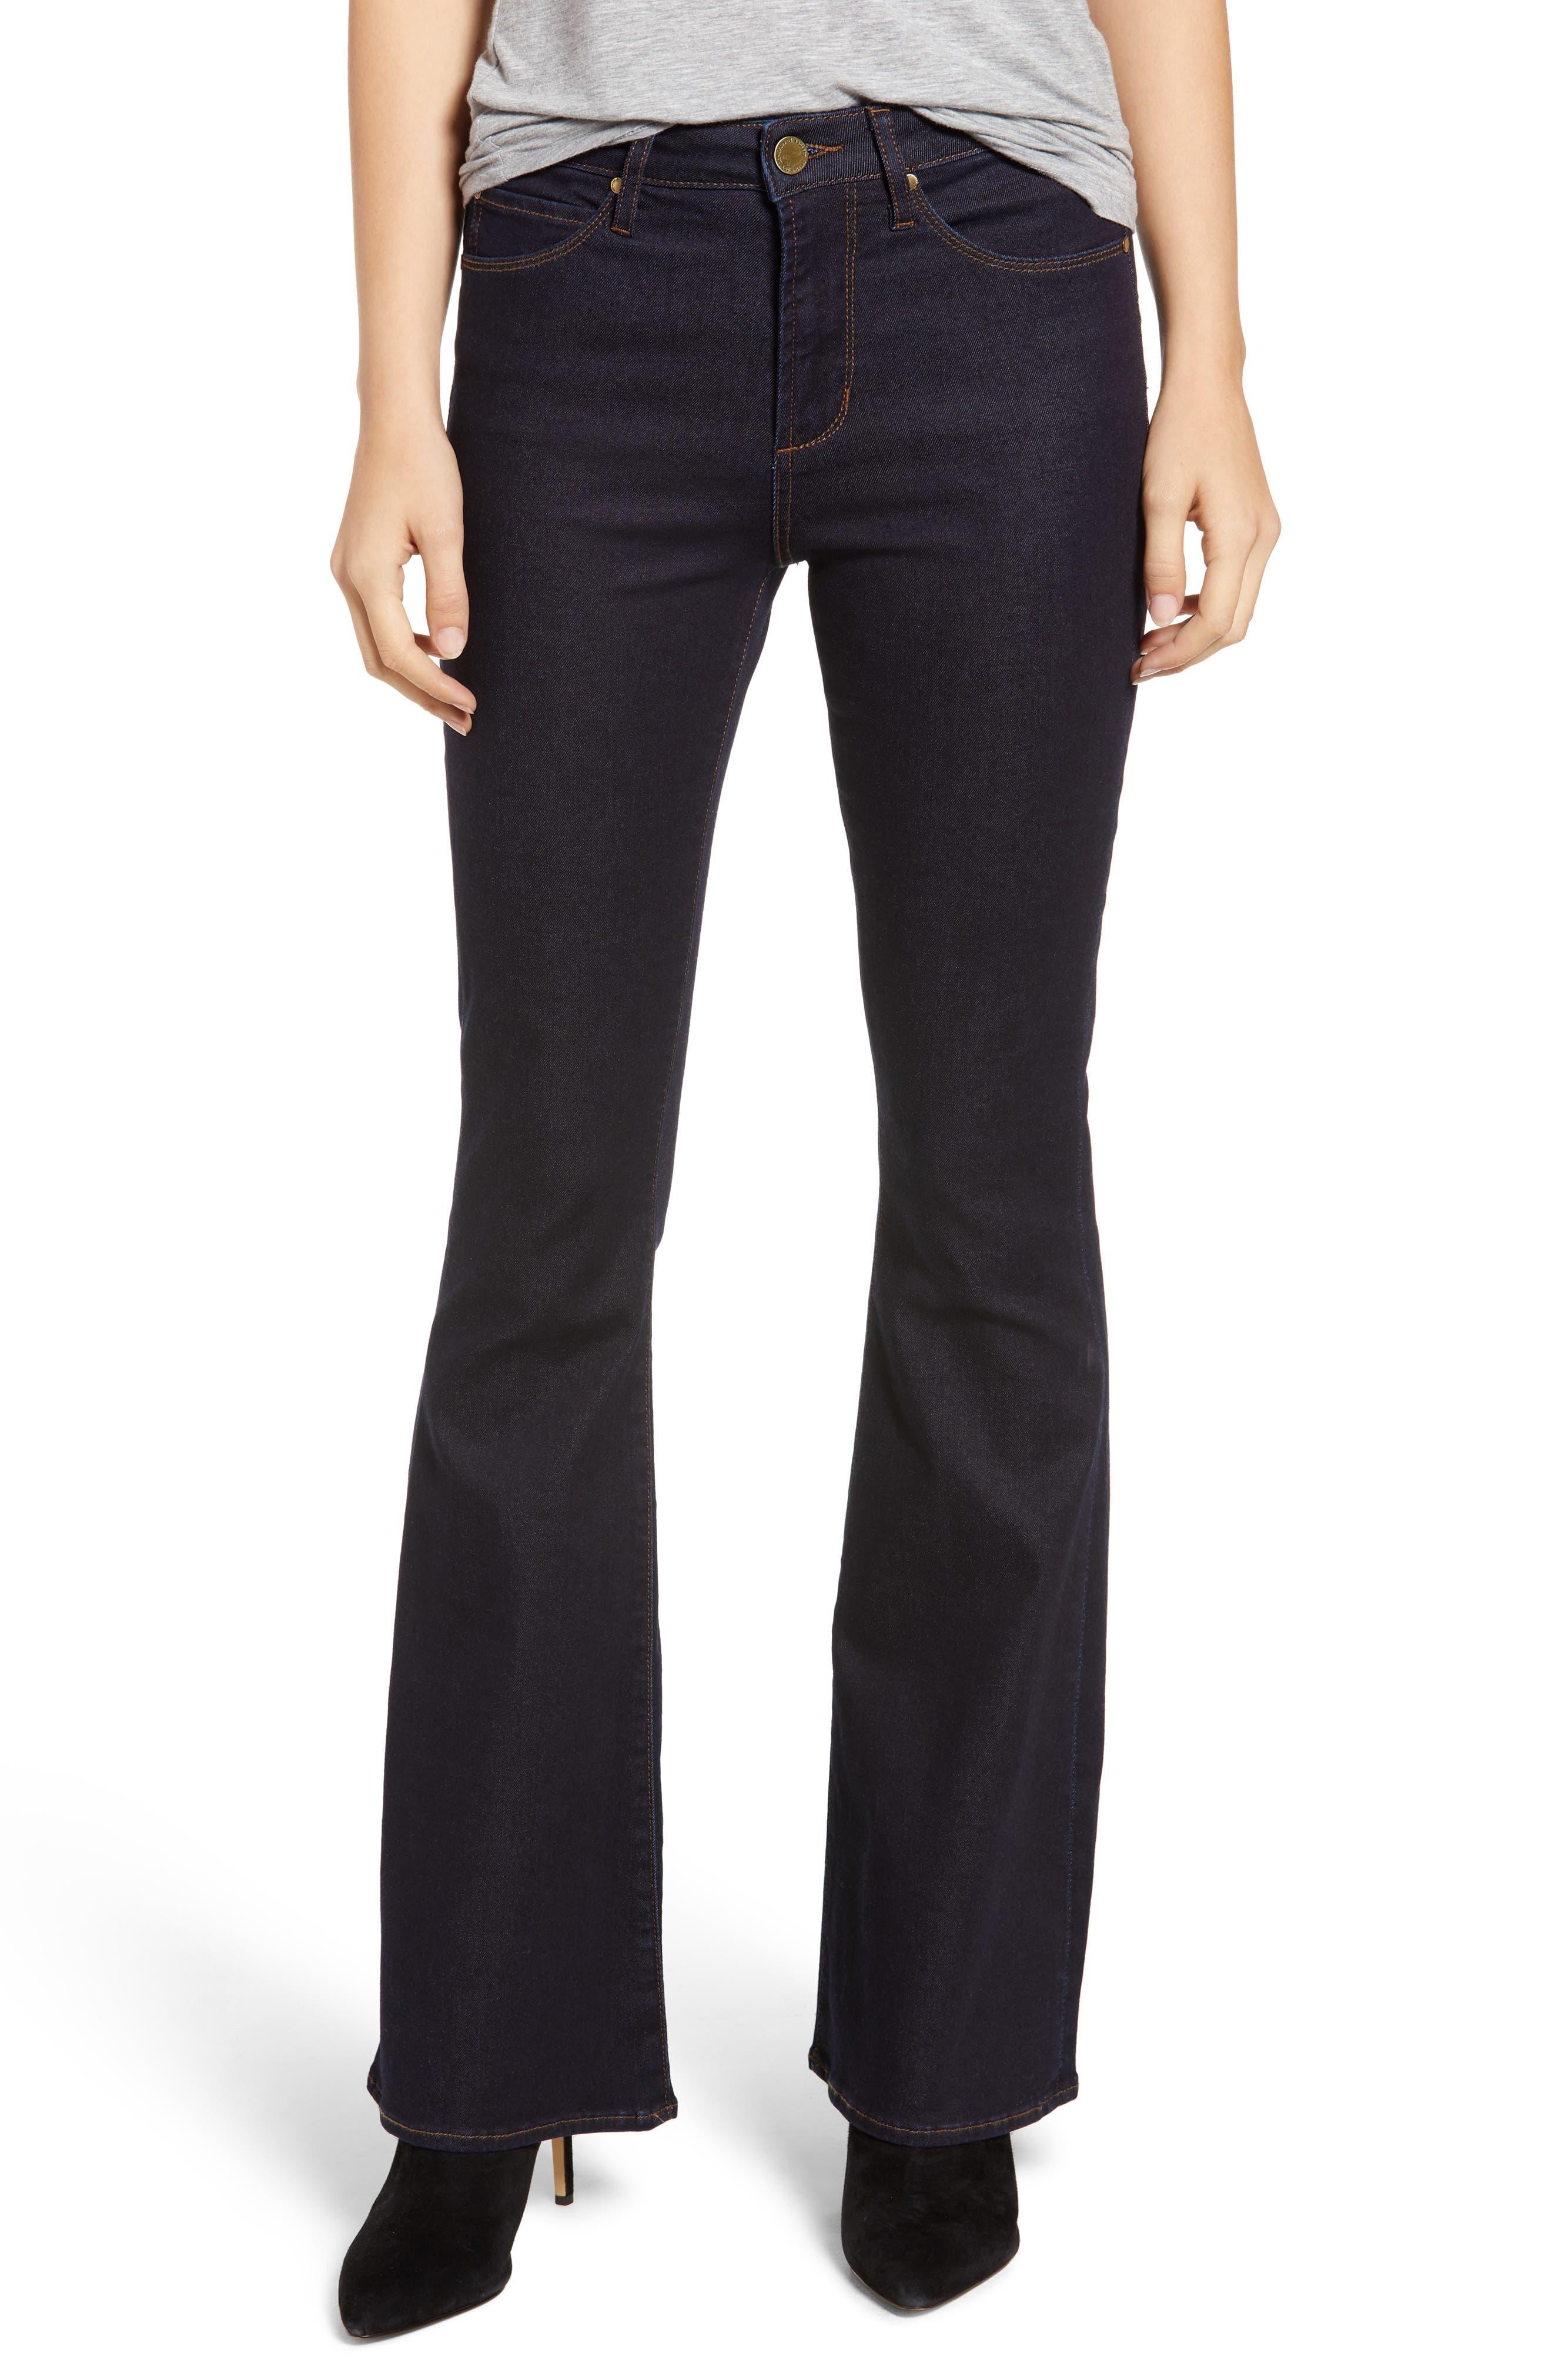 ARTICLES OF SOCIETY Bridgette High Waist Flare Jeans in Foley Dark Wash